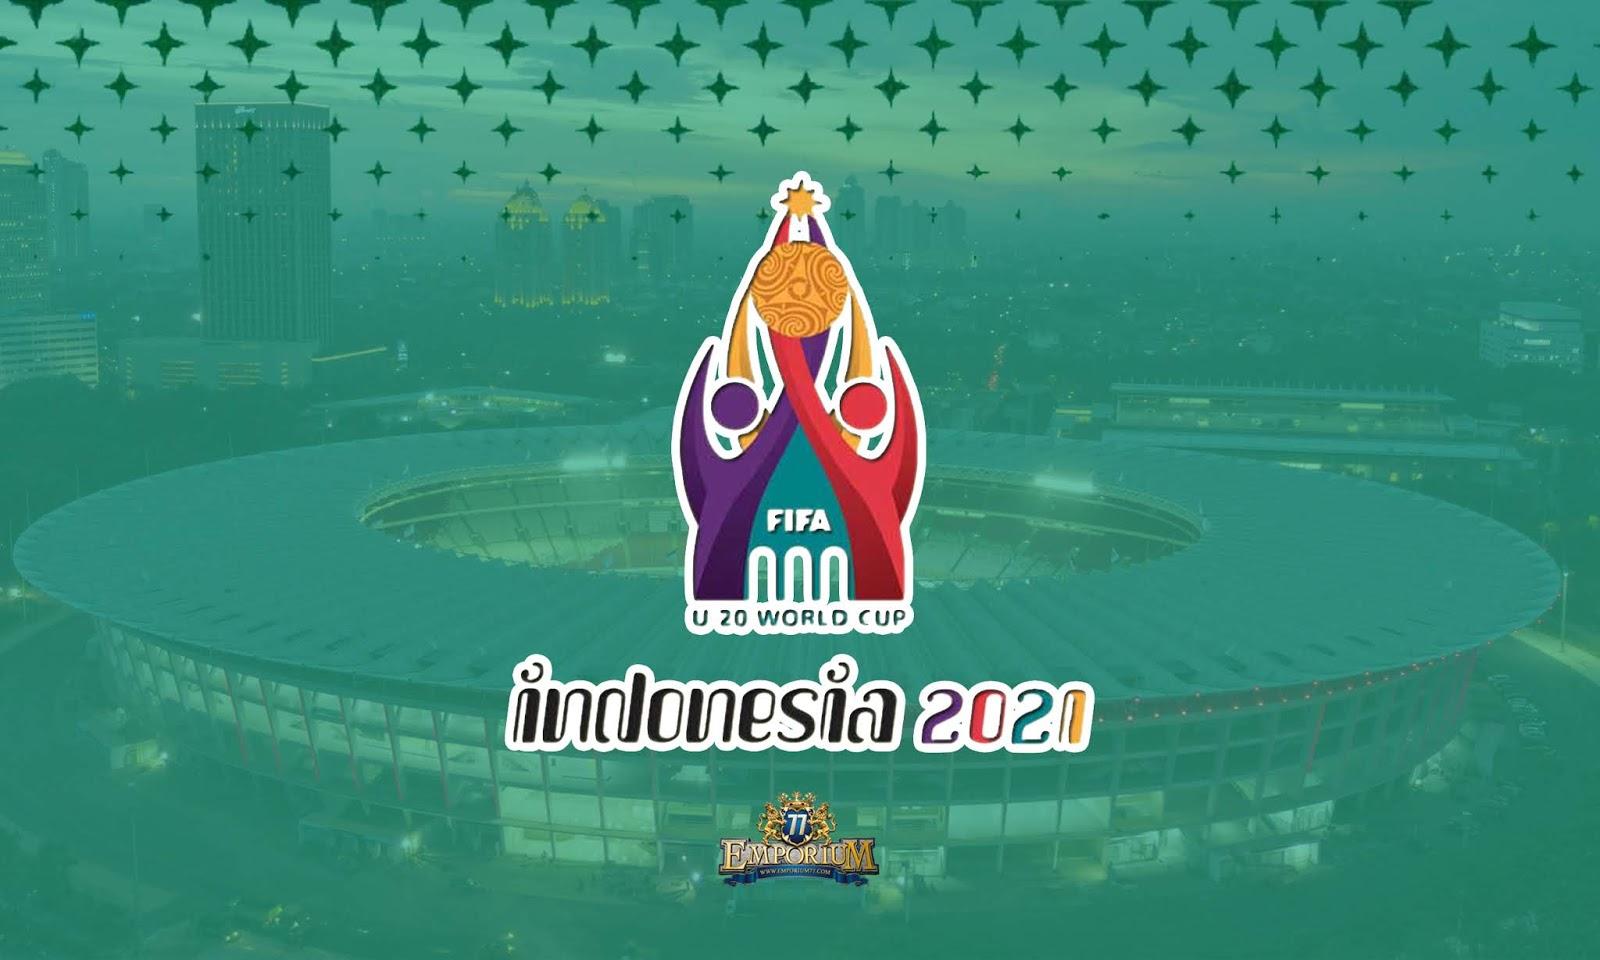 TabloidEmpo Cerita Di Balik Logo Piala Dunia U 20 2021